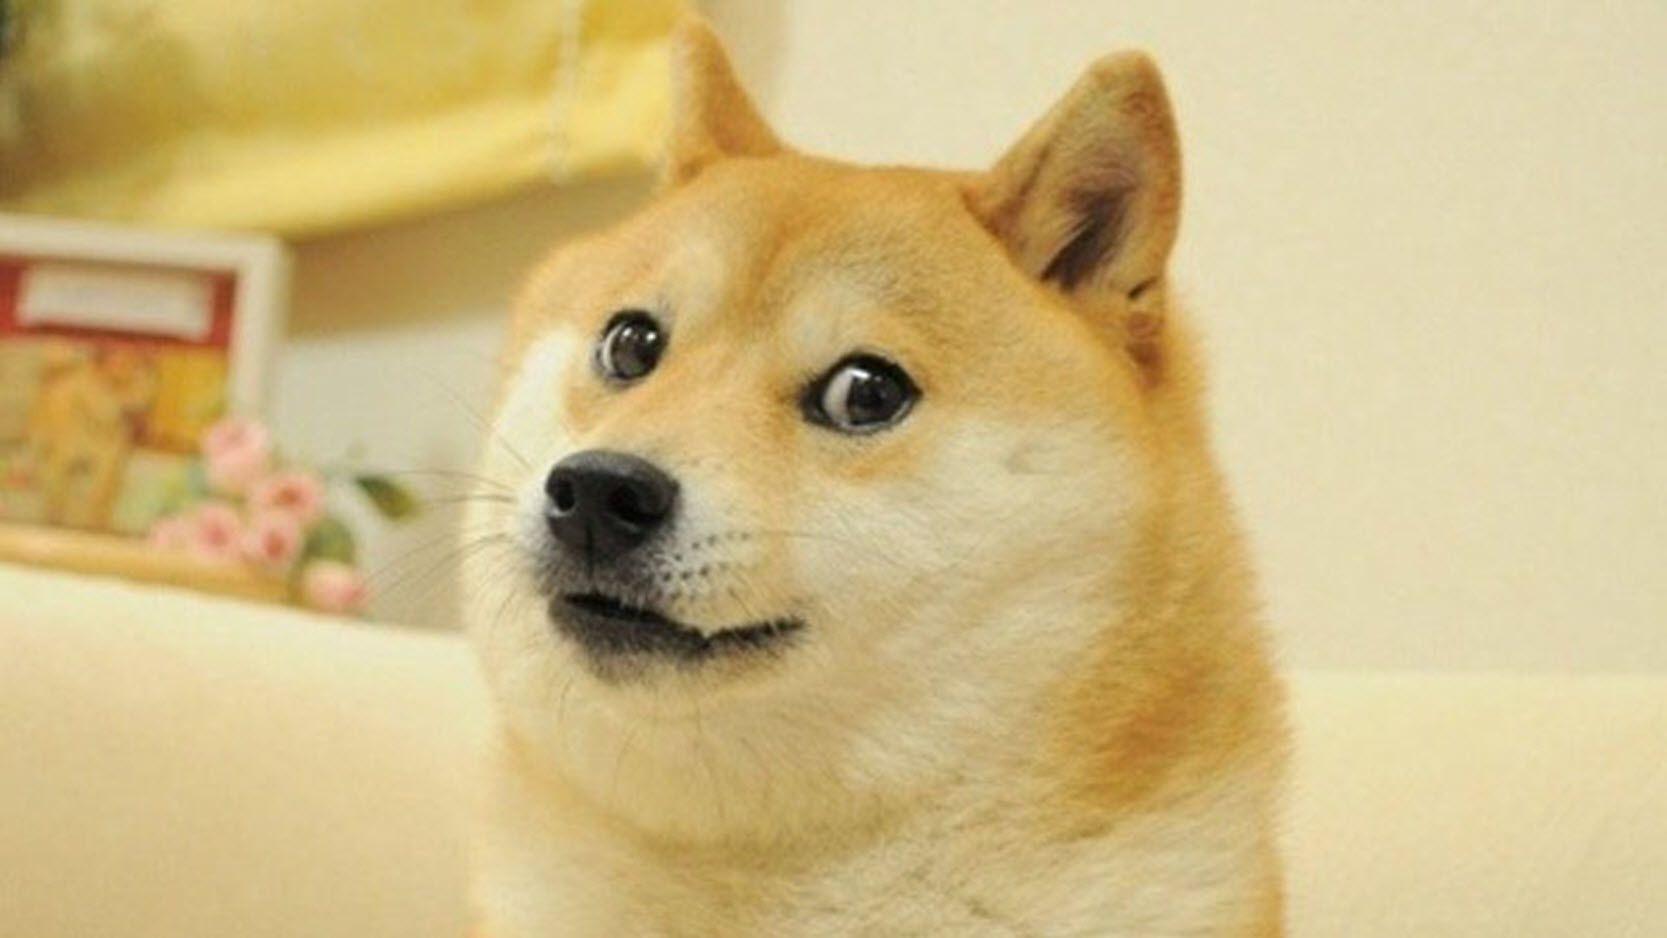 Shiba Inu dog giving sideways glance in viral Doge meme